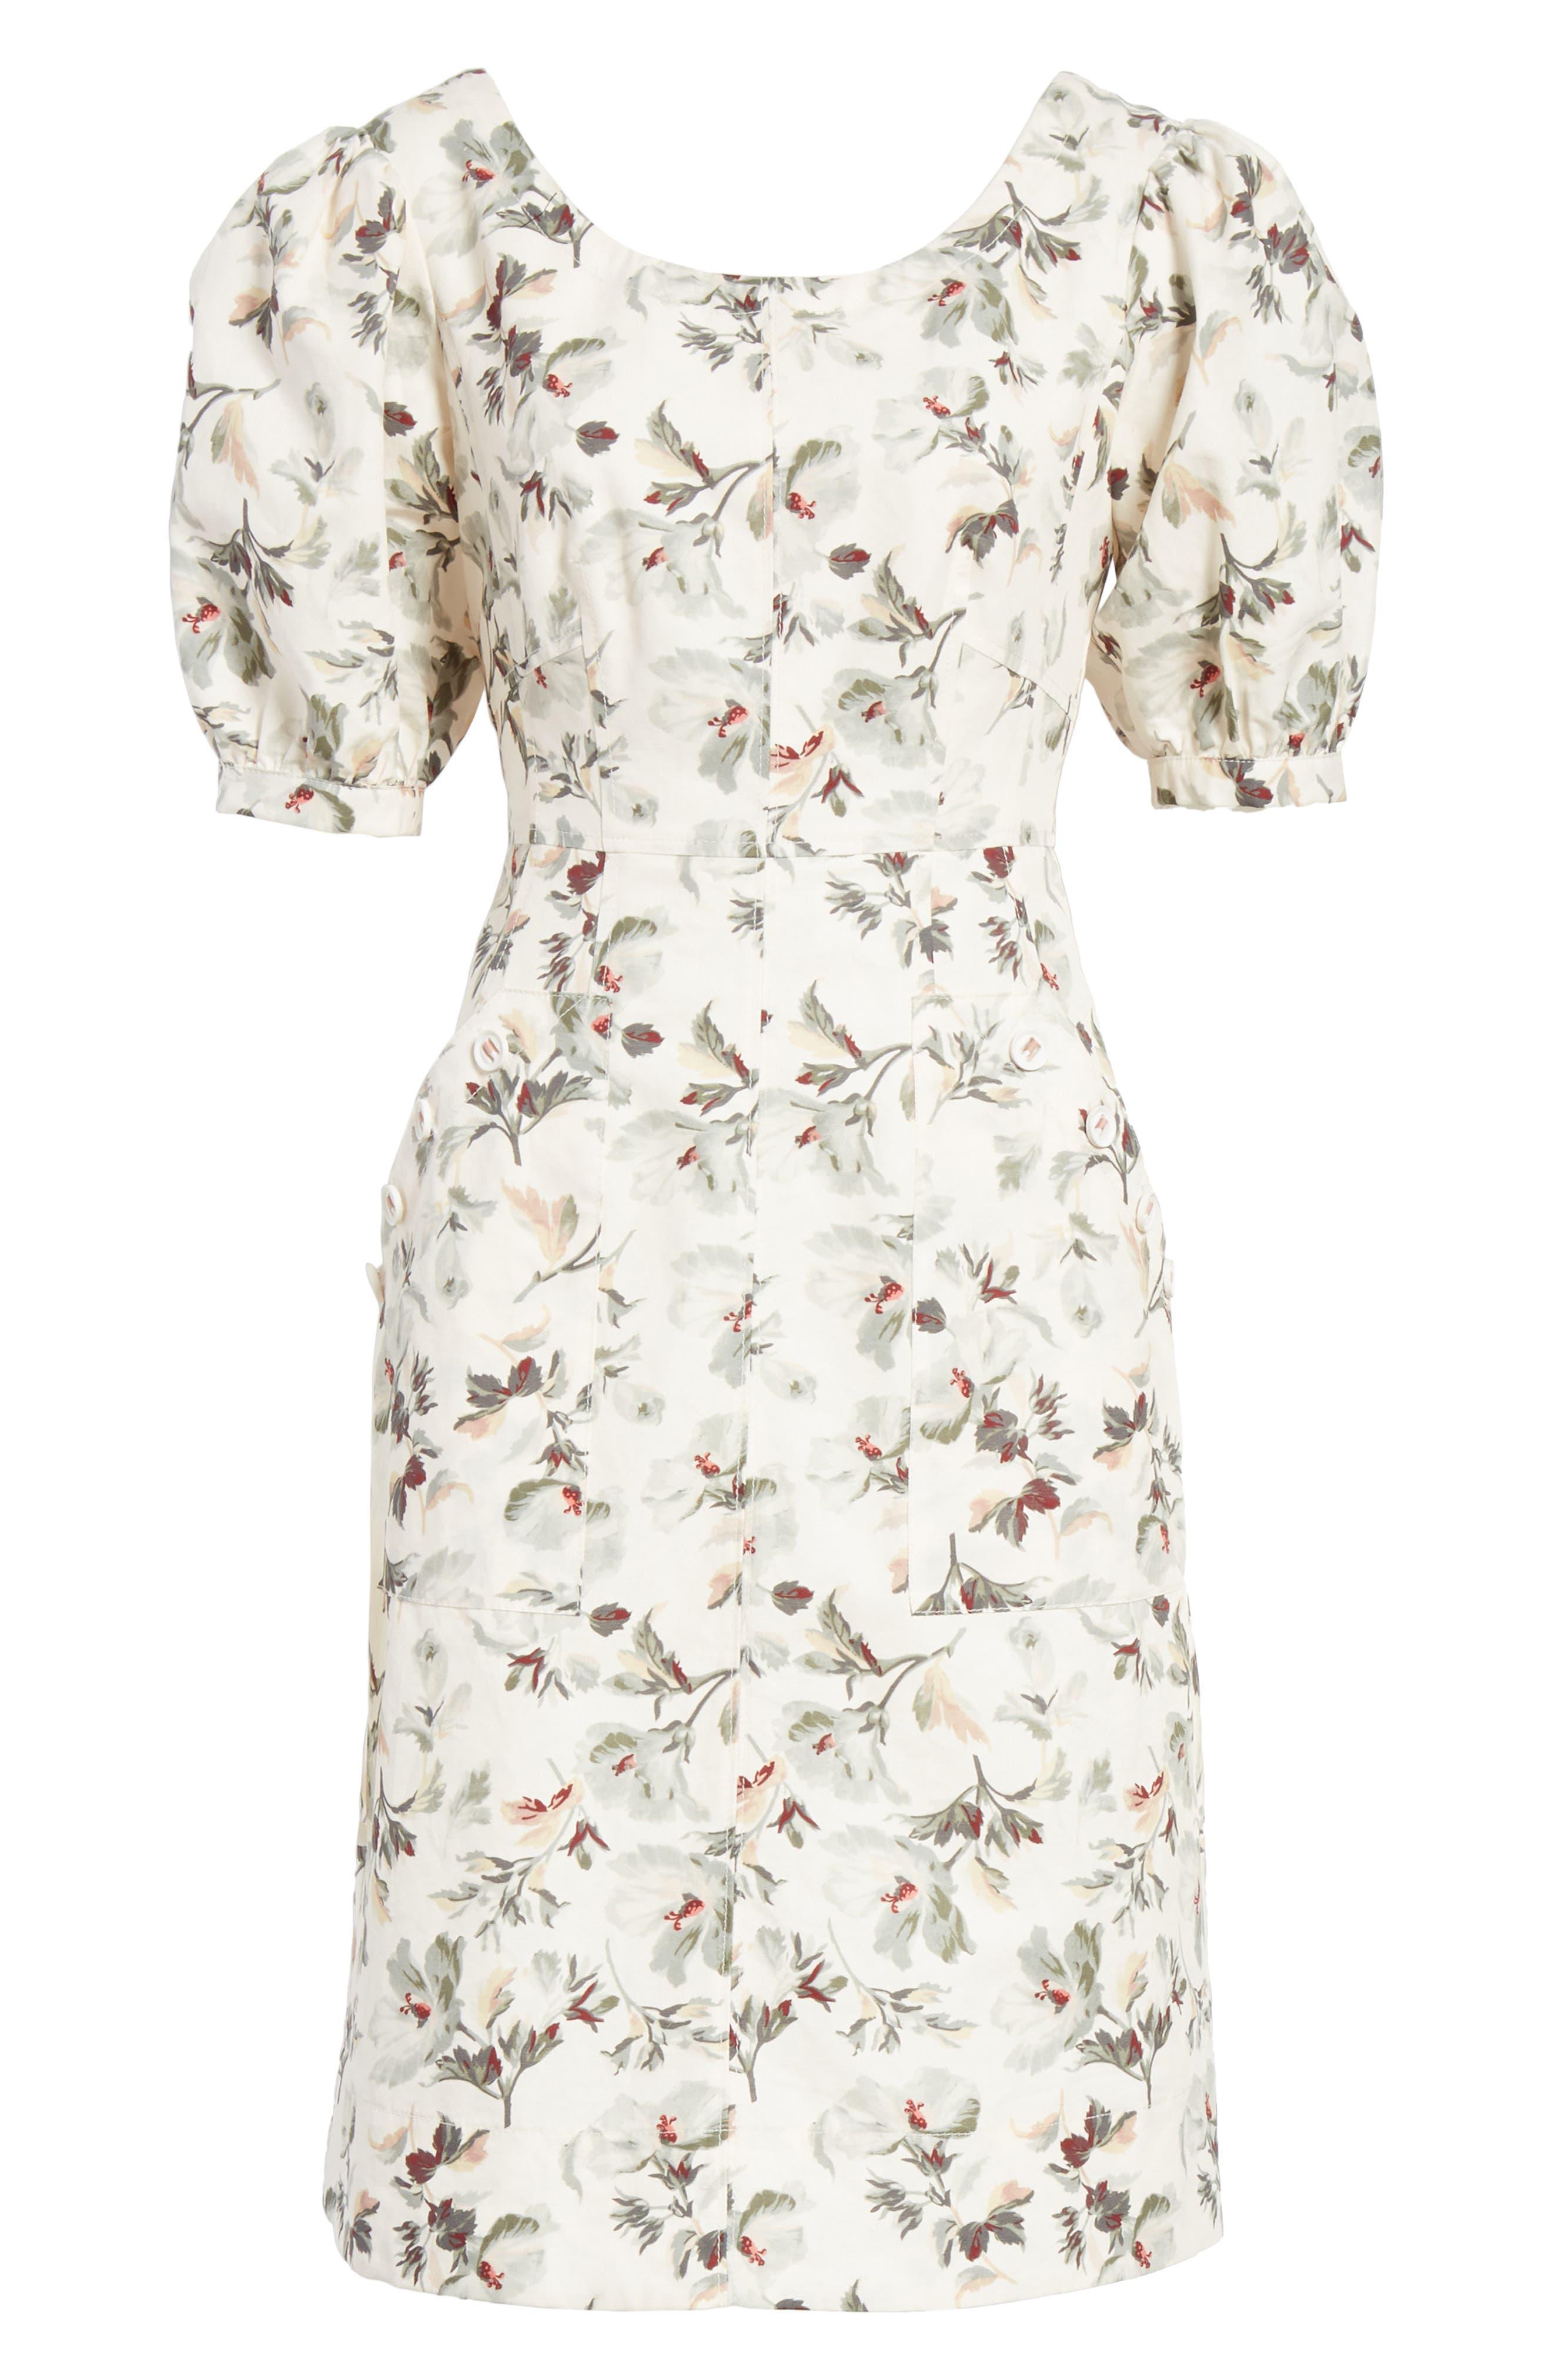 Puff Sleeve Floral Cotton Linen Dress,                             Alternate thumbnail 6, color,                             905